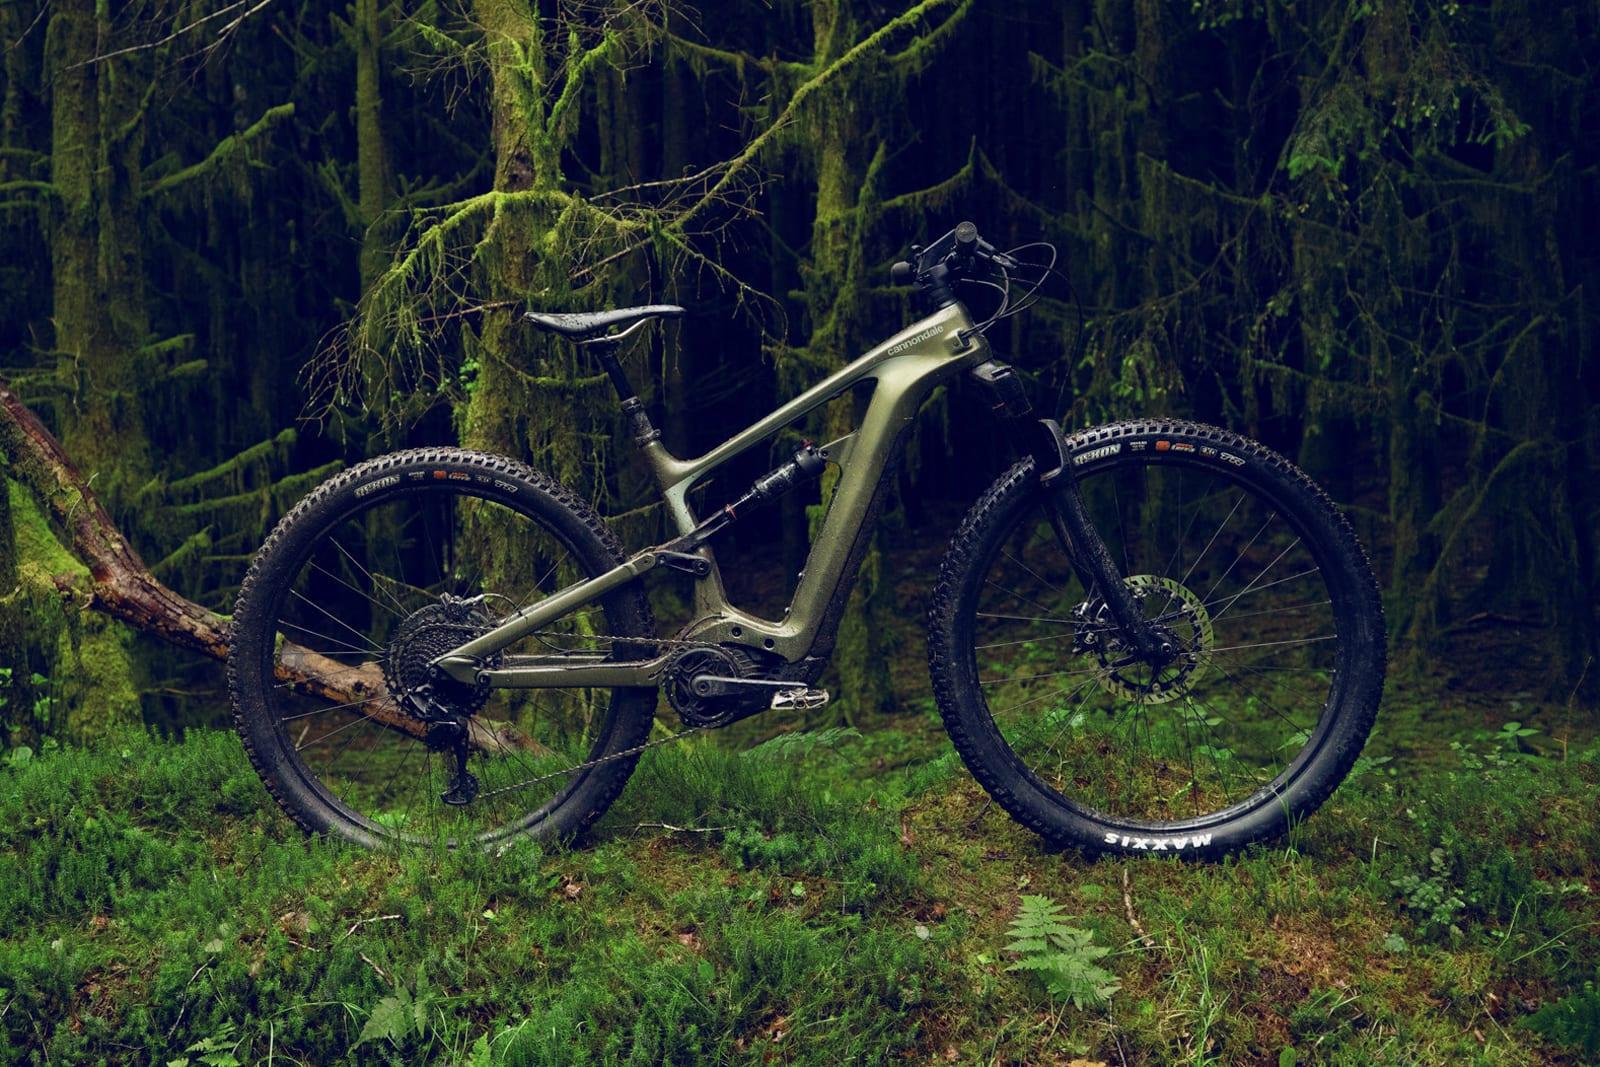 Cannondale Habit NEO electric mountain bike